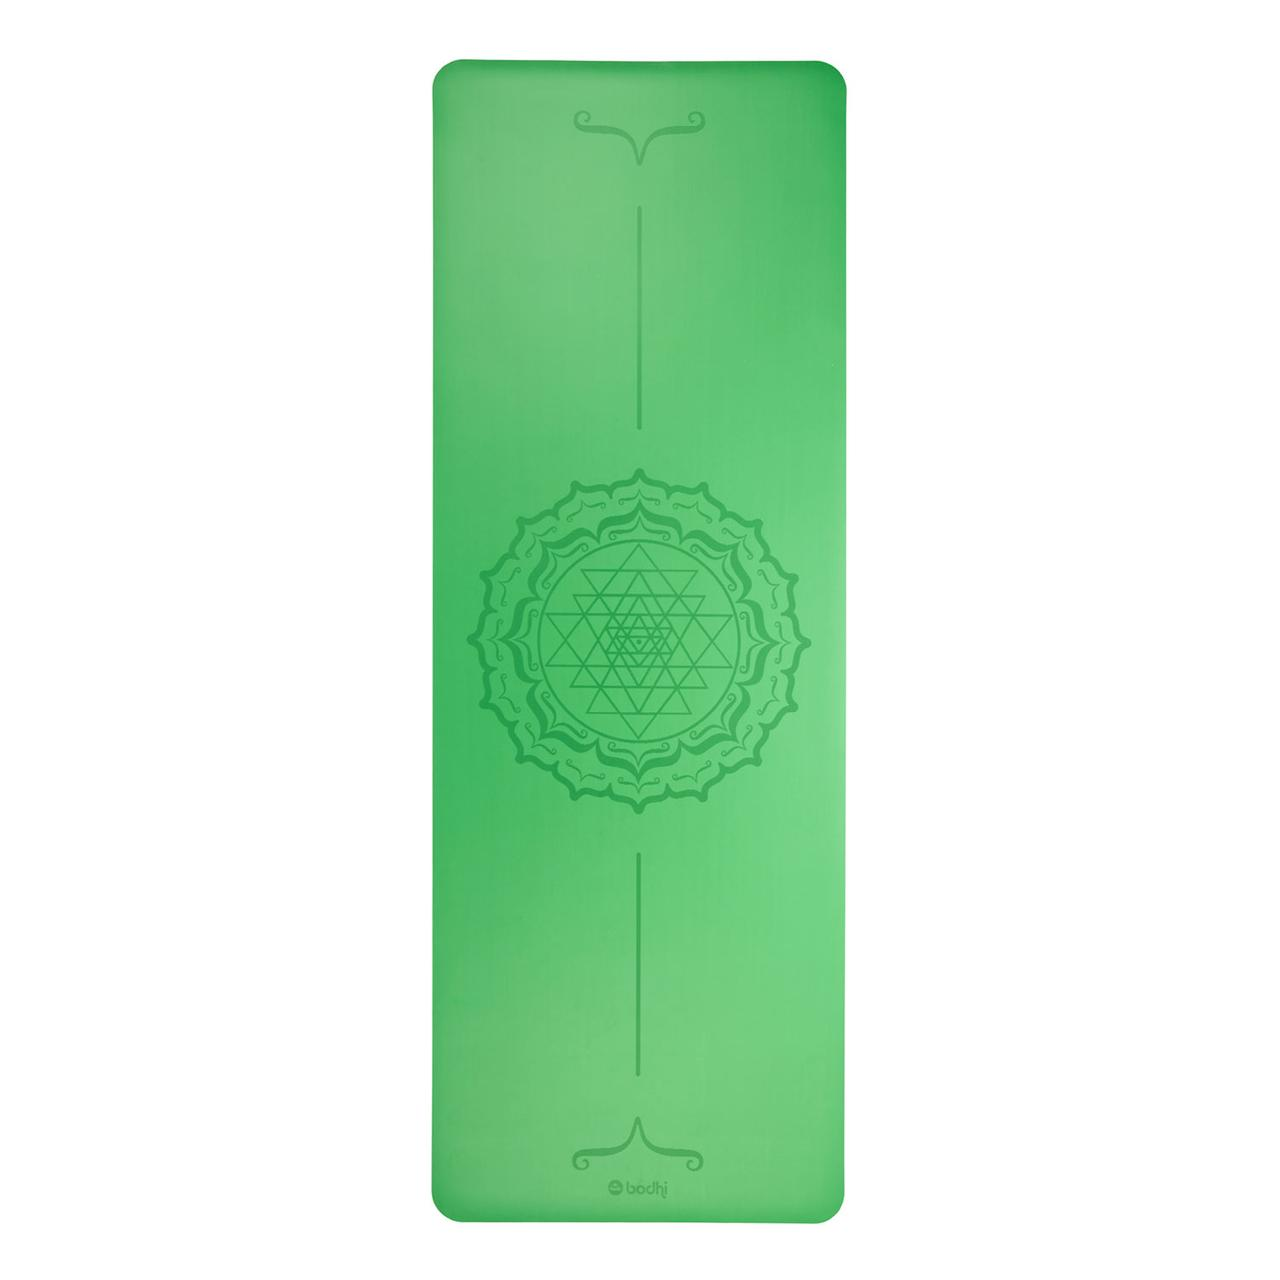 Коврик для йоги FHOENIX with Yantra-Mandala (Феникс Янтра  Мандала), зеленый